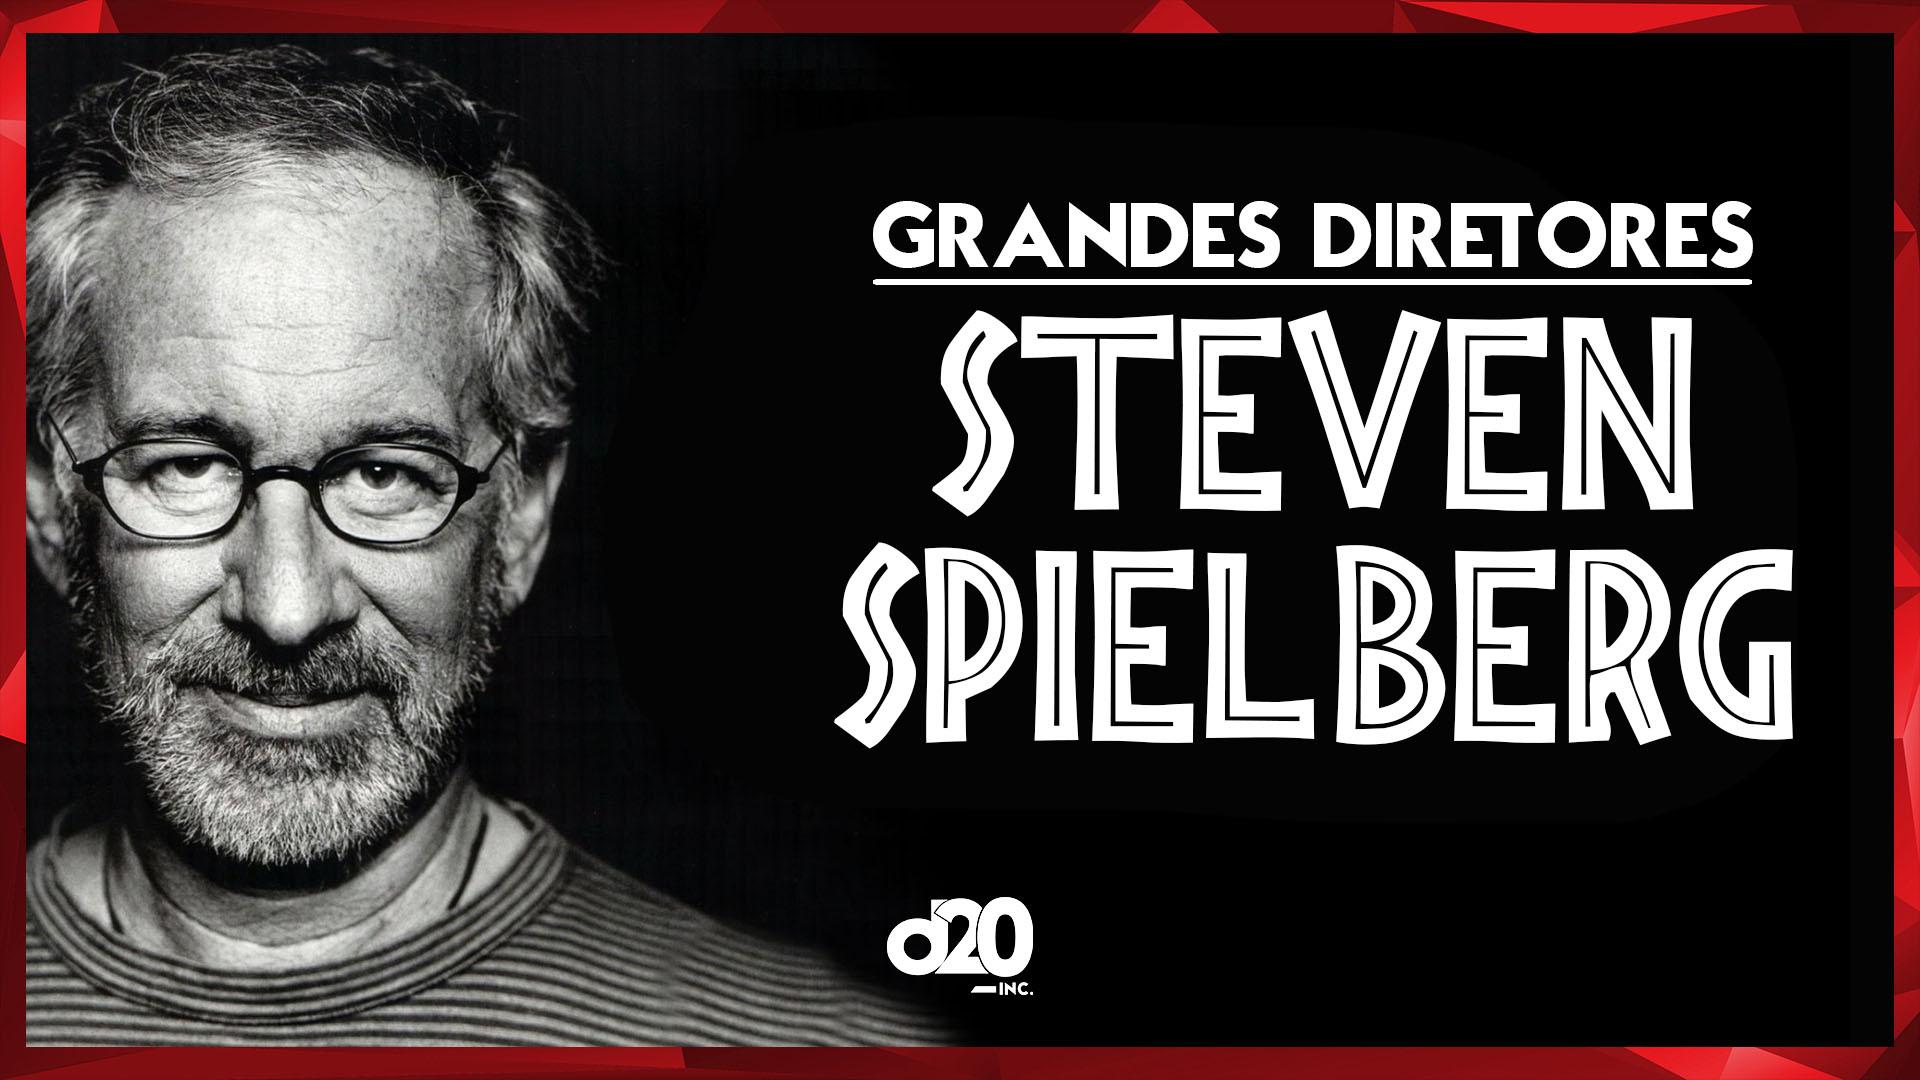 Steven Spielberg (Grandes Diretores) | D20 Lab 15